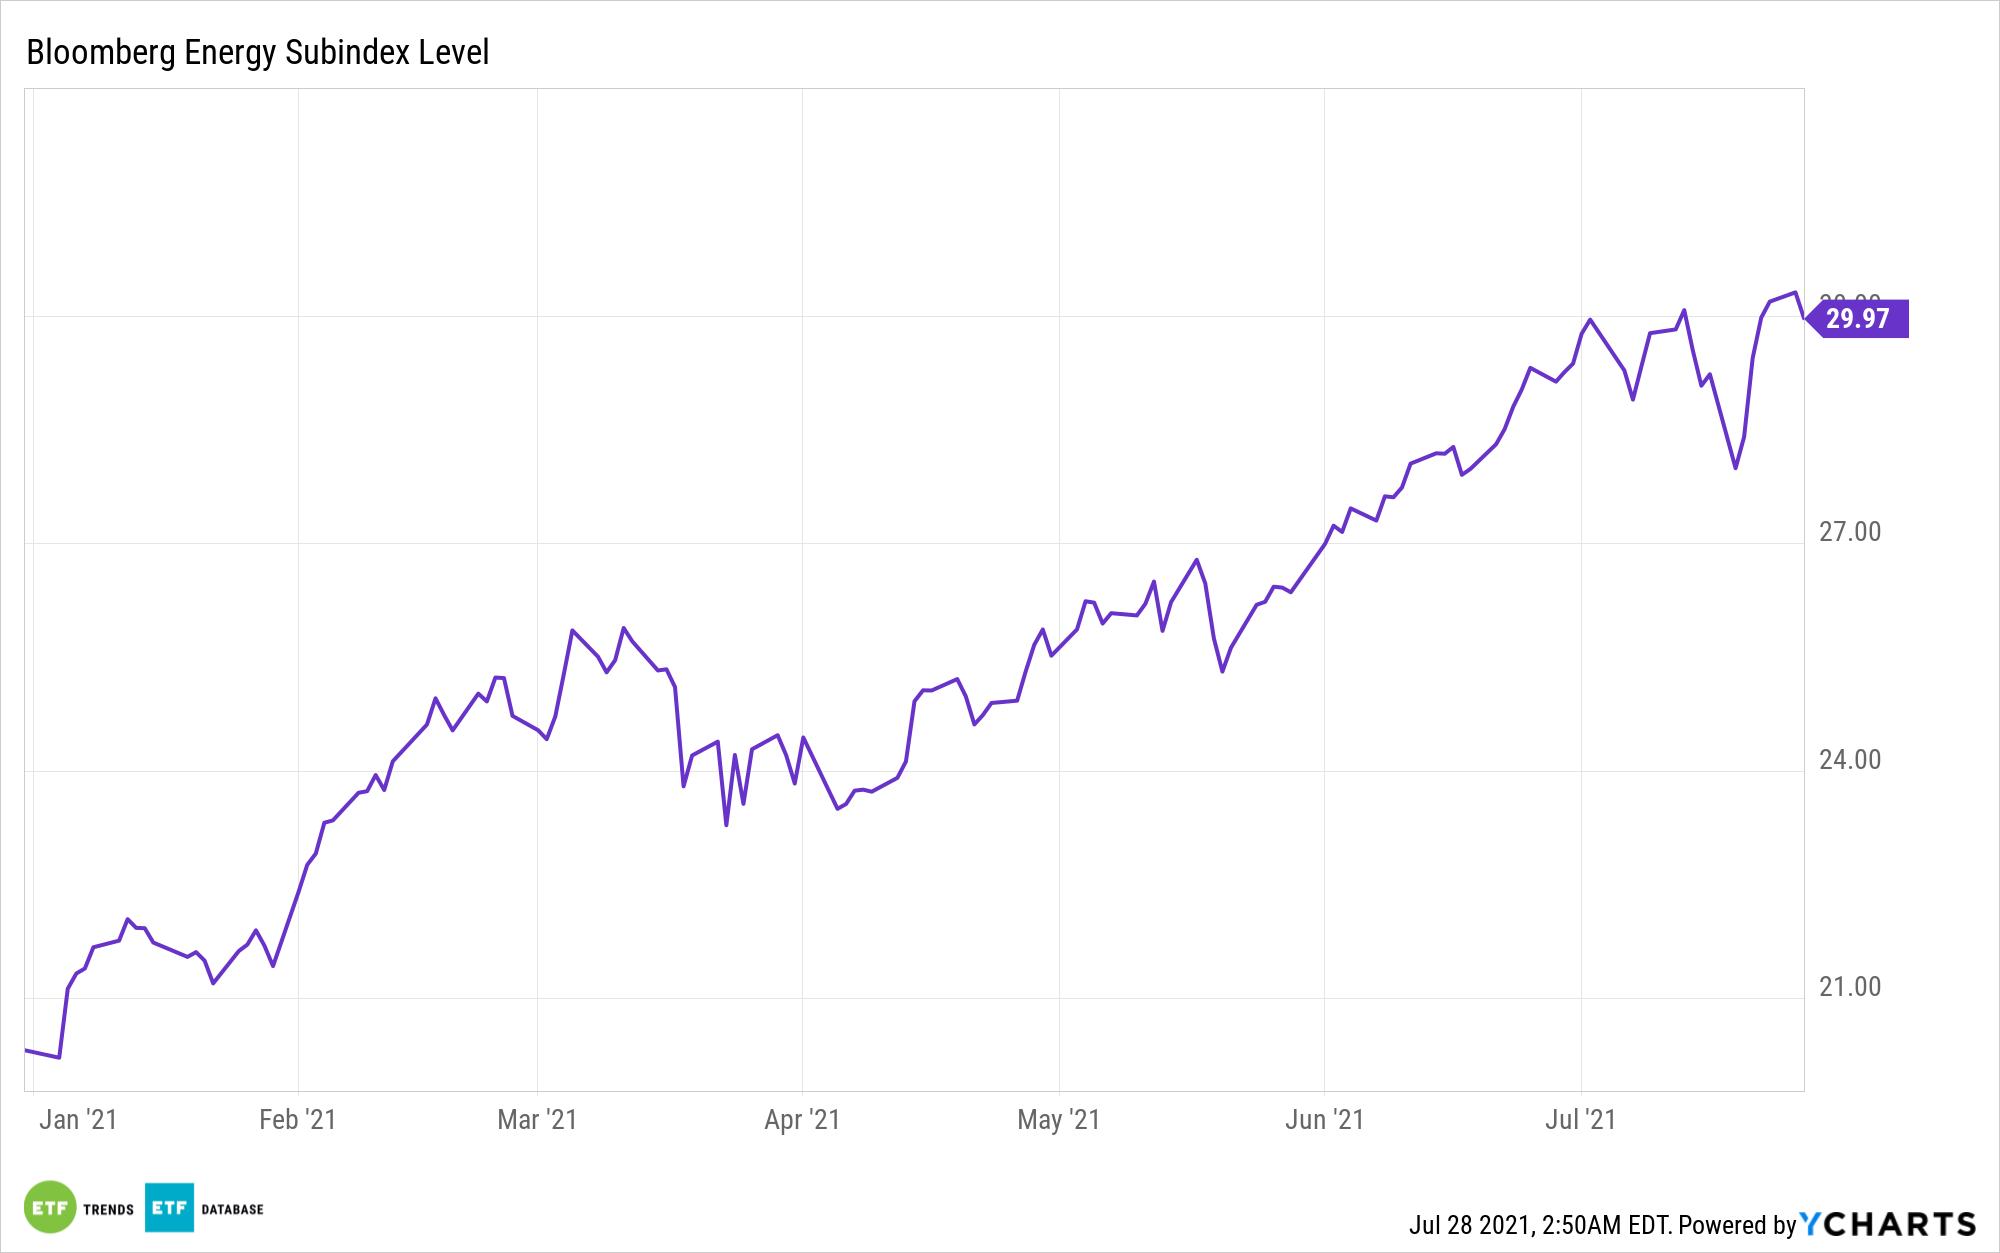 ^BNRGS Chart